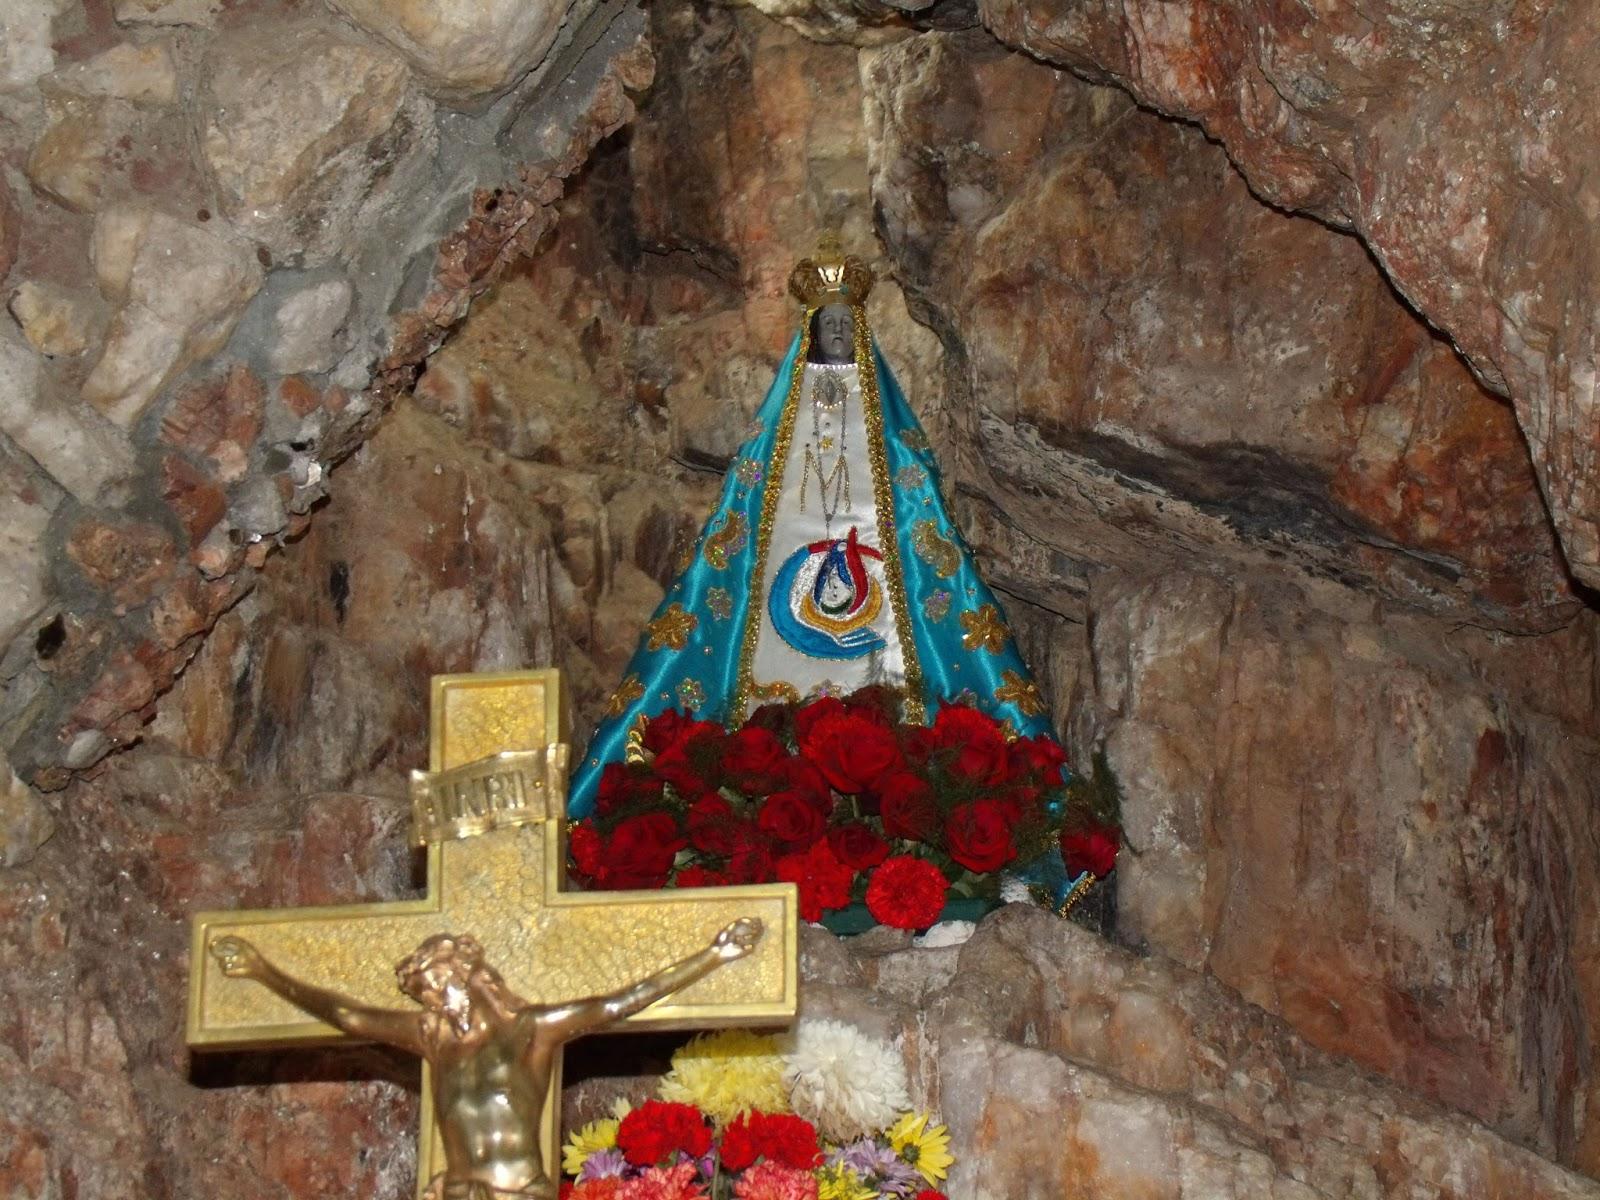 La Milagrosa Patrona: Virgen del Valle de Catamarca, Argentina (8 dic 2da. de Pascua)